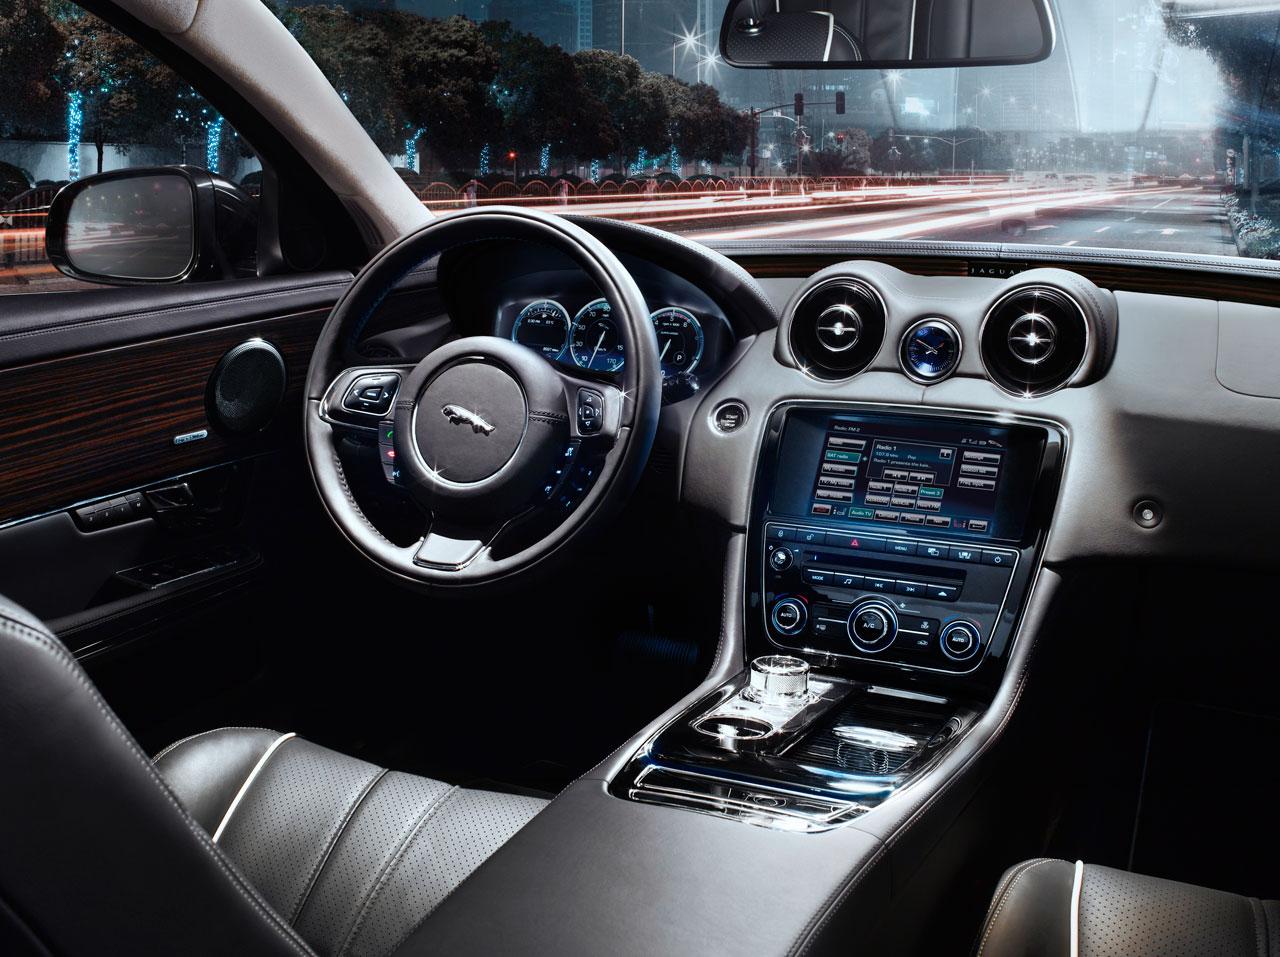 http://4.bp.blogspot.com/-EKh7ww5xV1Y/T6Pcr7V940I/AAAAAAAACQg/_xkTaT1MN-Q/s1600/jaguar+xj+interior.jpg